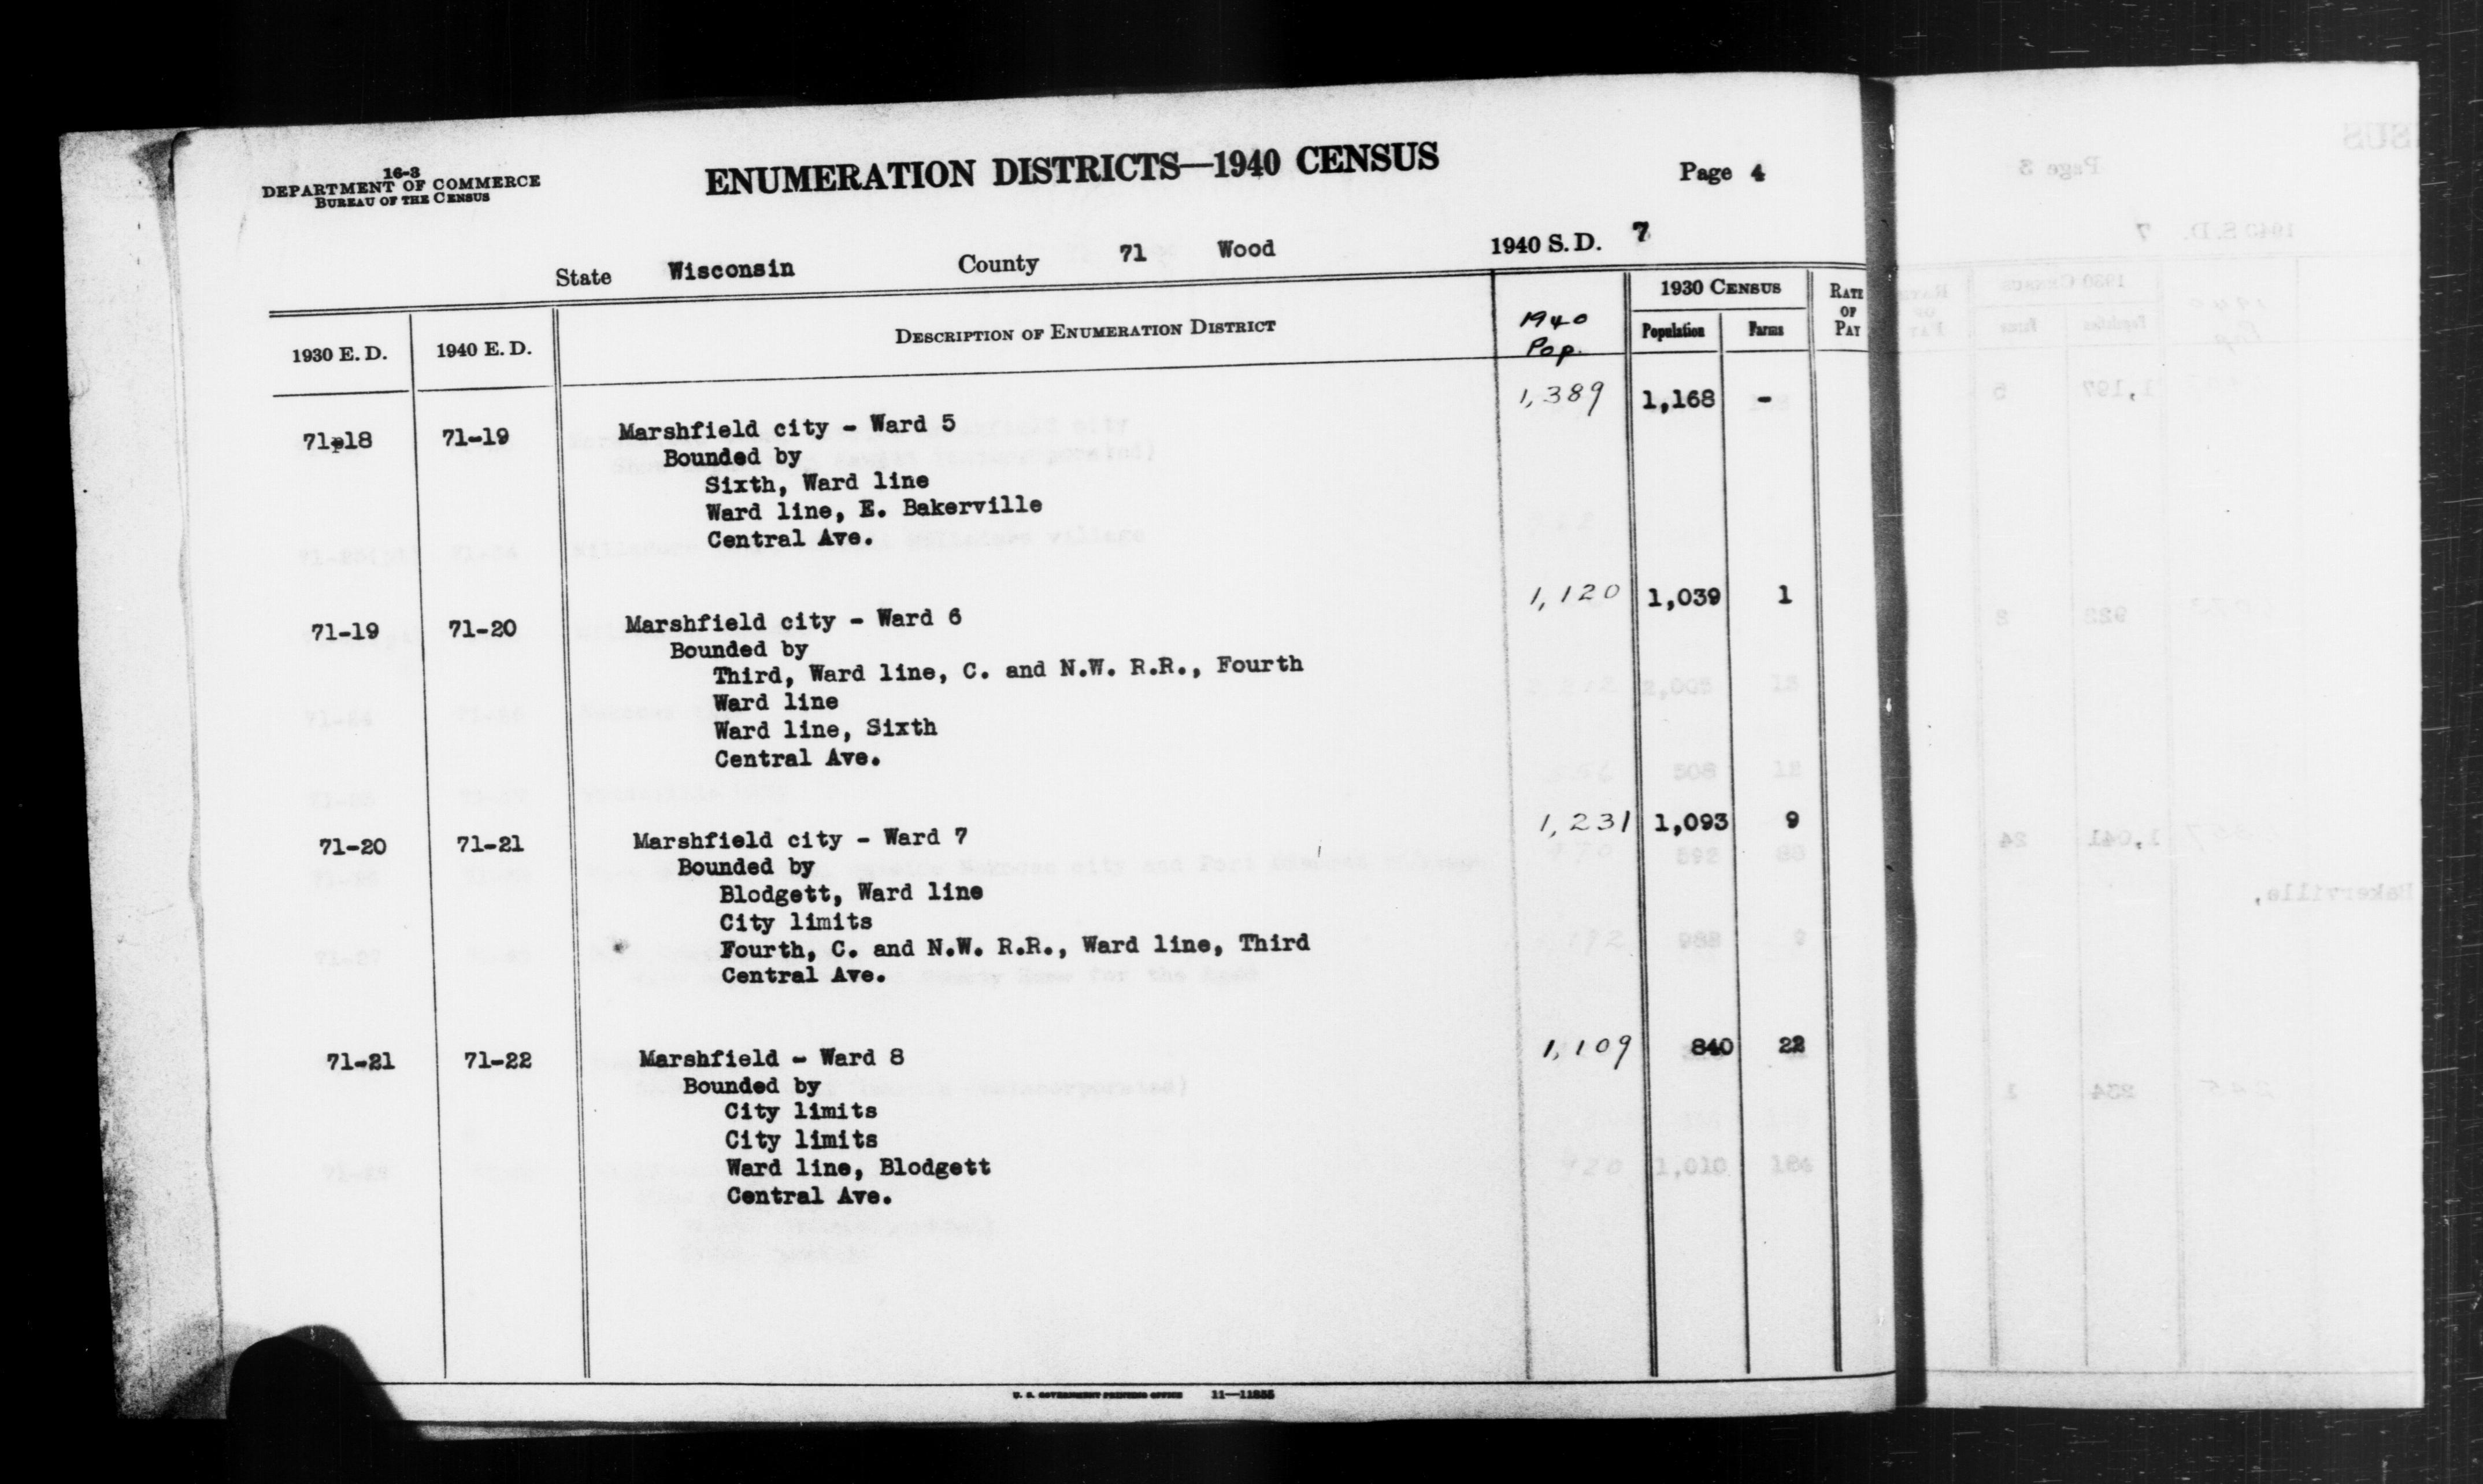 1940 Census Enumeration District Descriptions - Wisconsin - Wood County - ED 71-19, ED 71-20, ED 71-21, ED 71-22